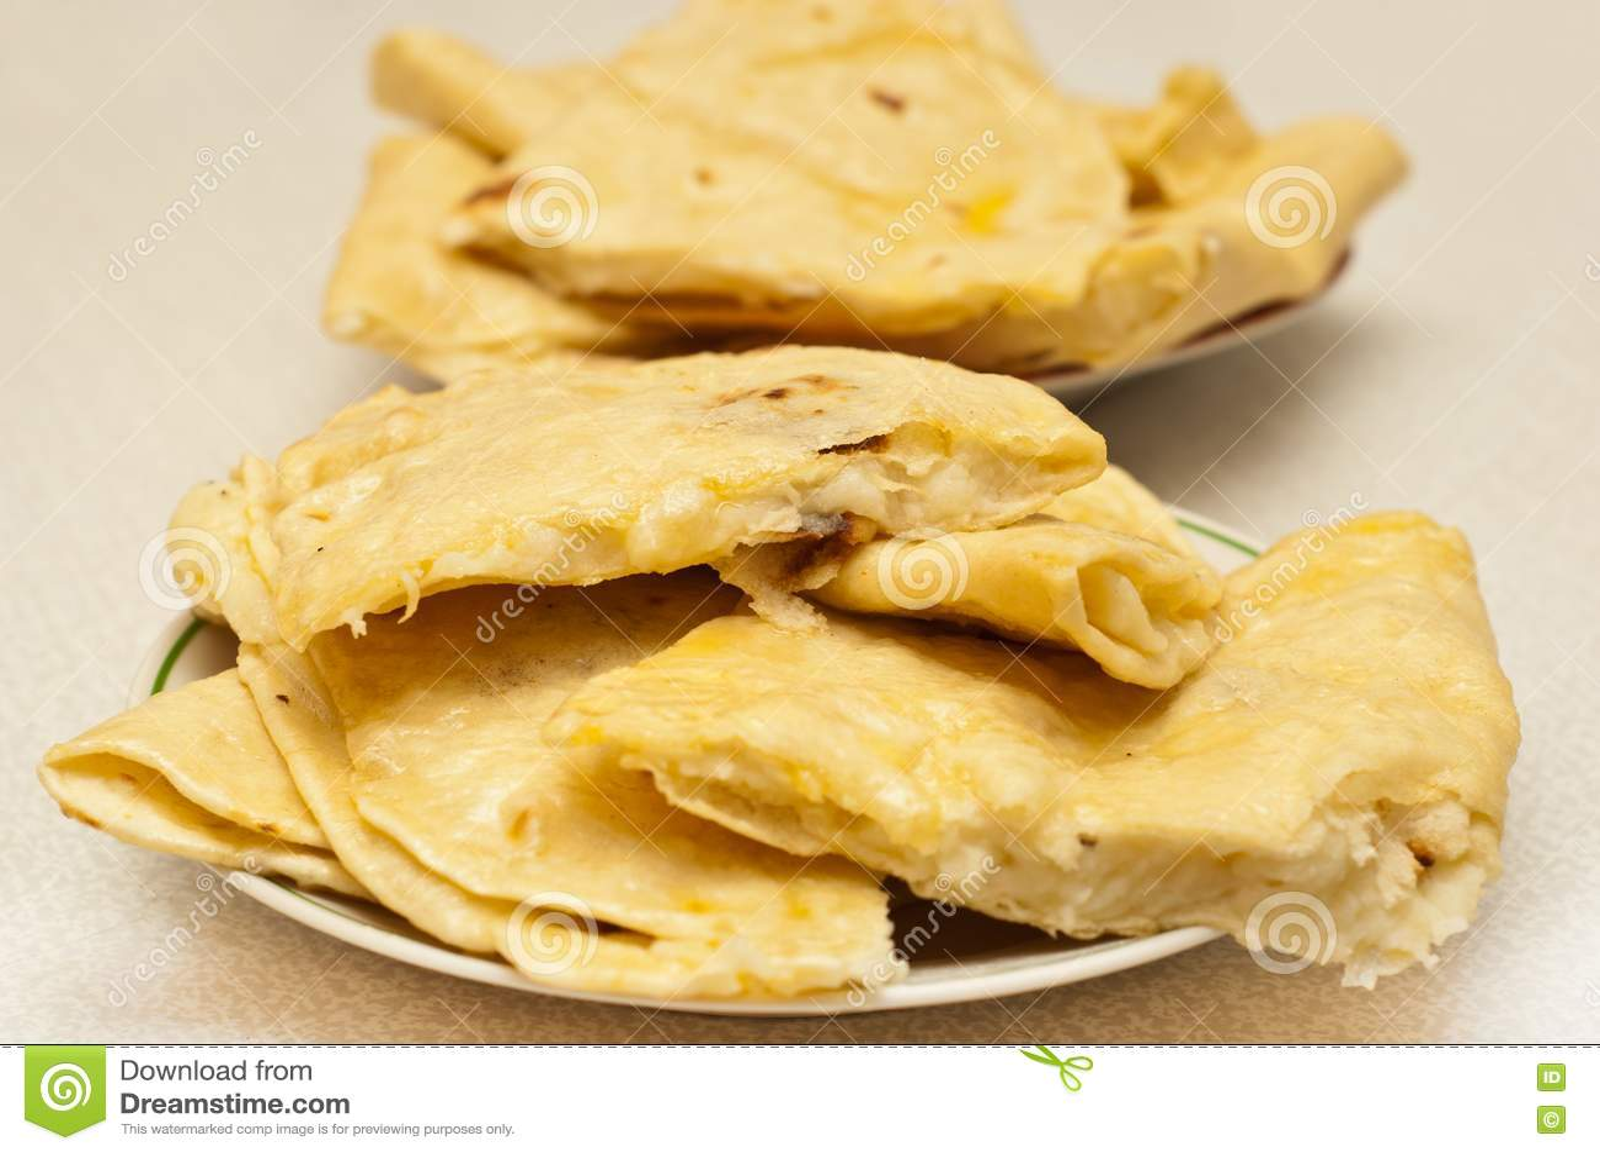 la pomme de terre tatare a bourr 233 la p 226 tisserie frite photographie stock image 19171182